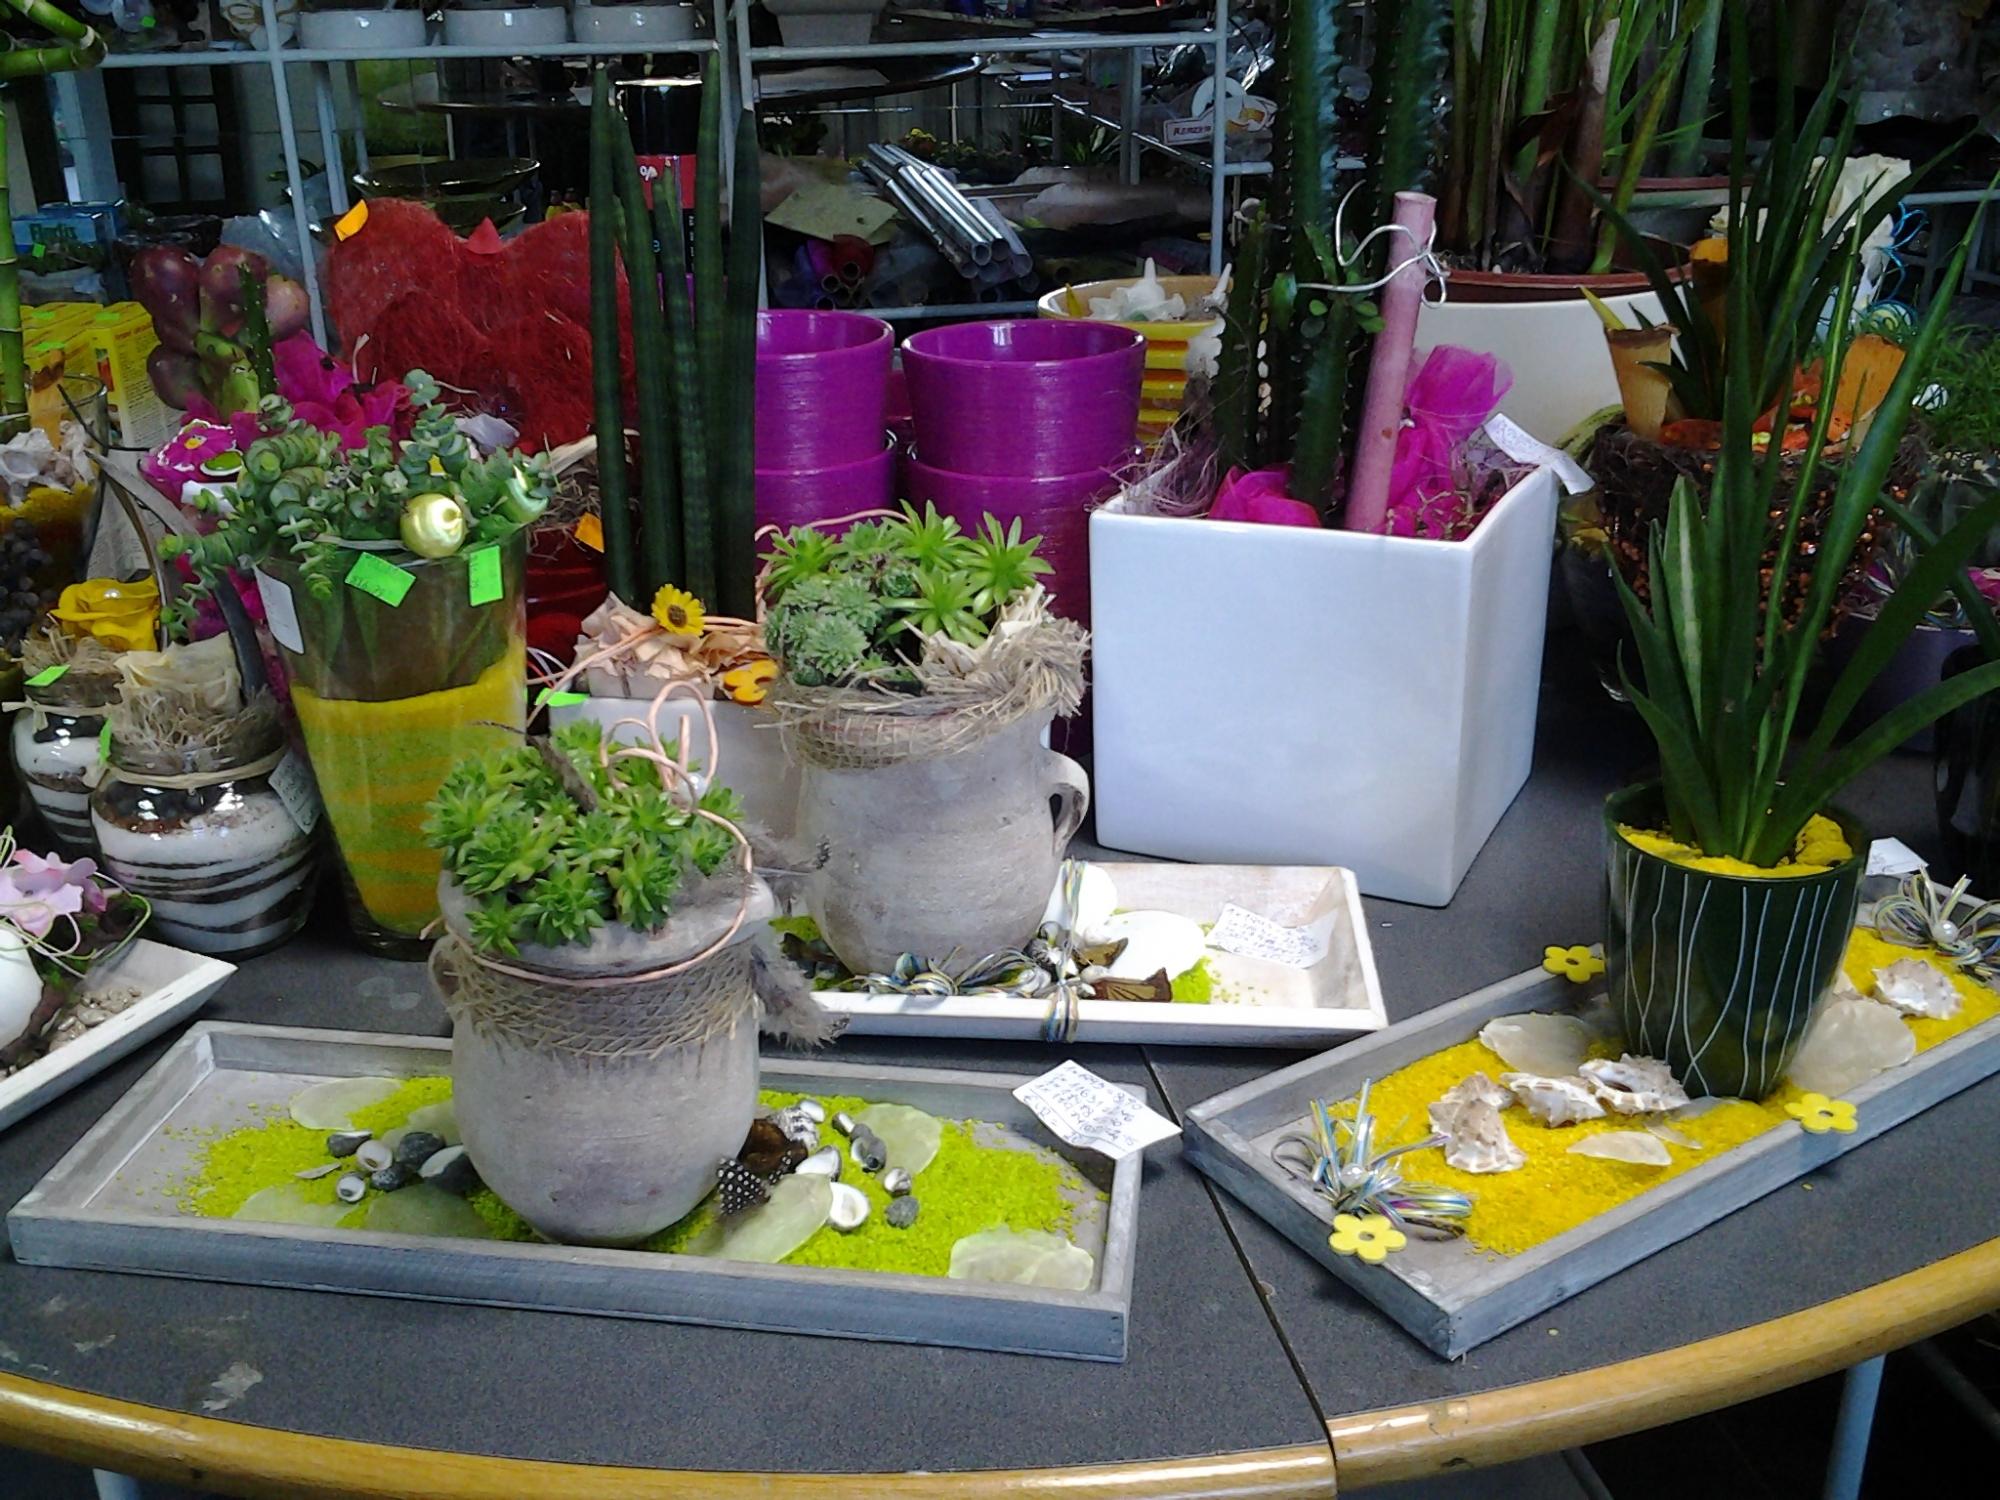 Vrtnarstvo Matko Cvetličarstvo